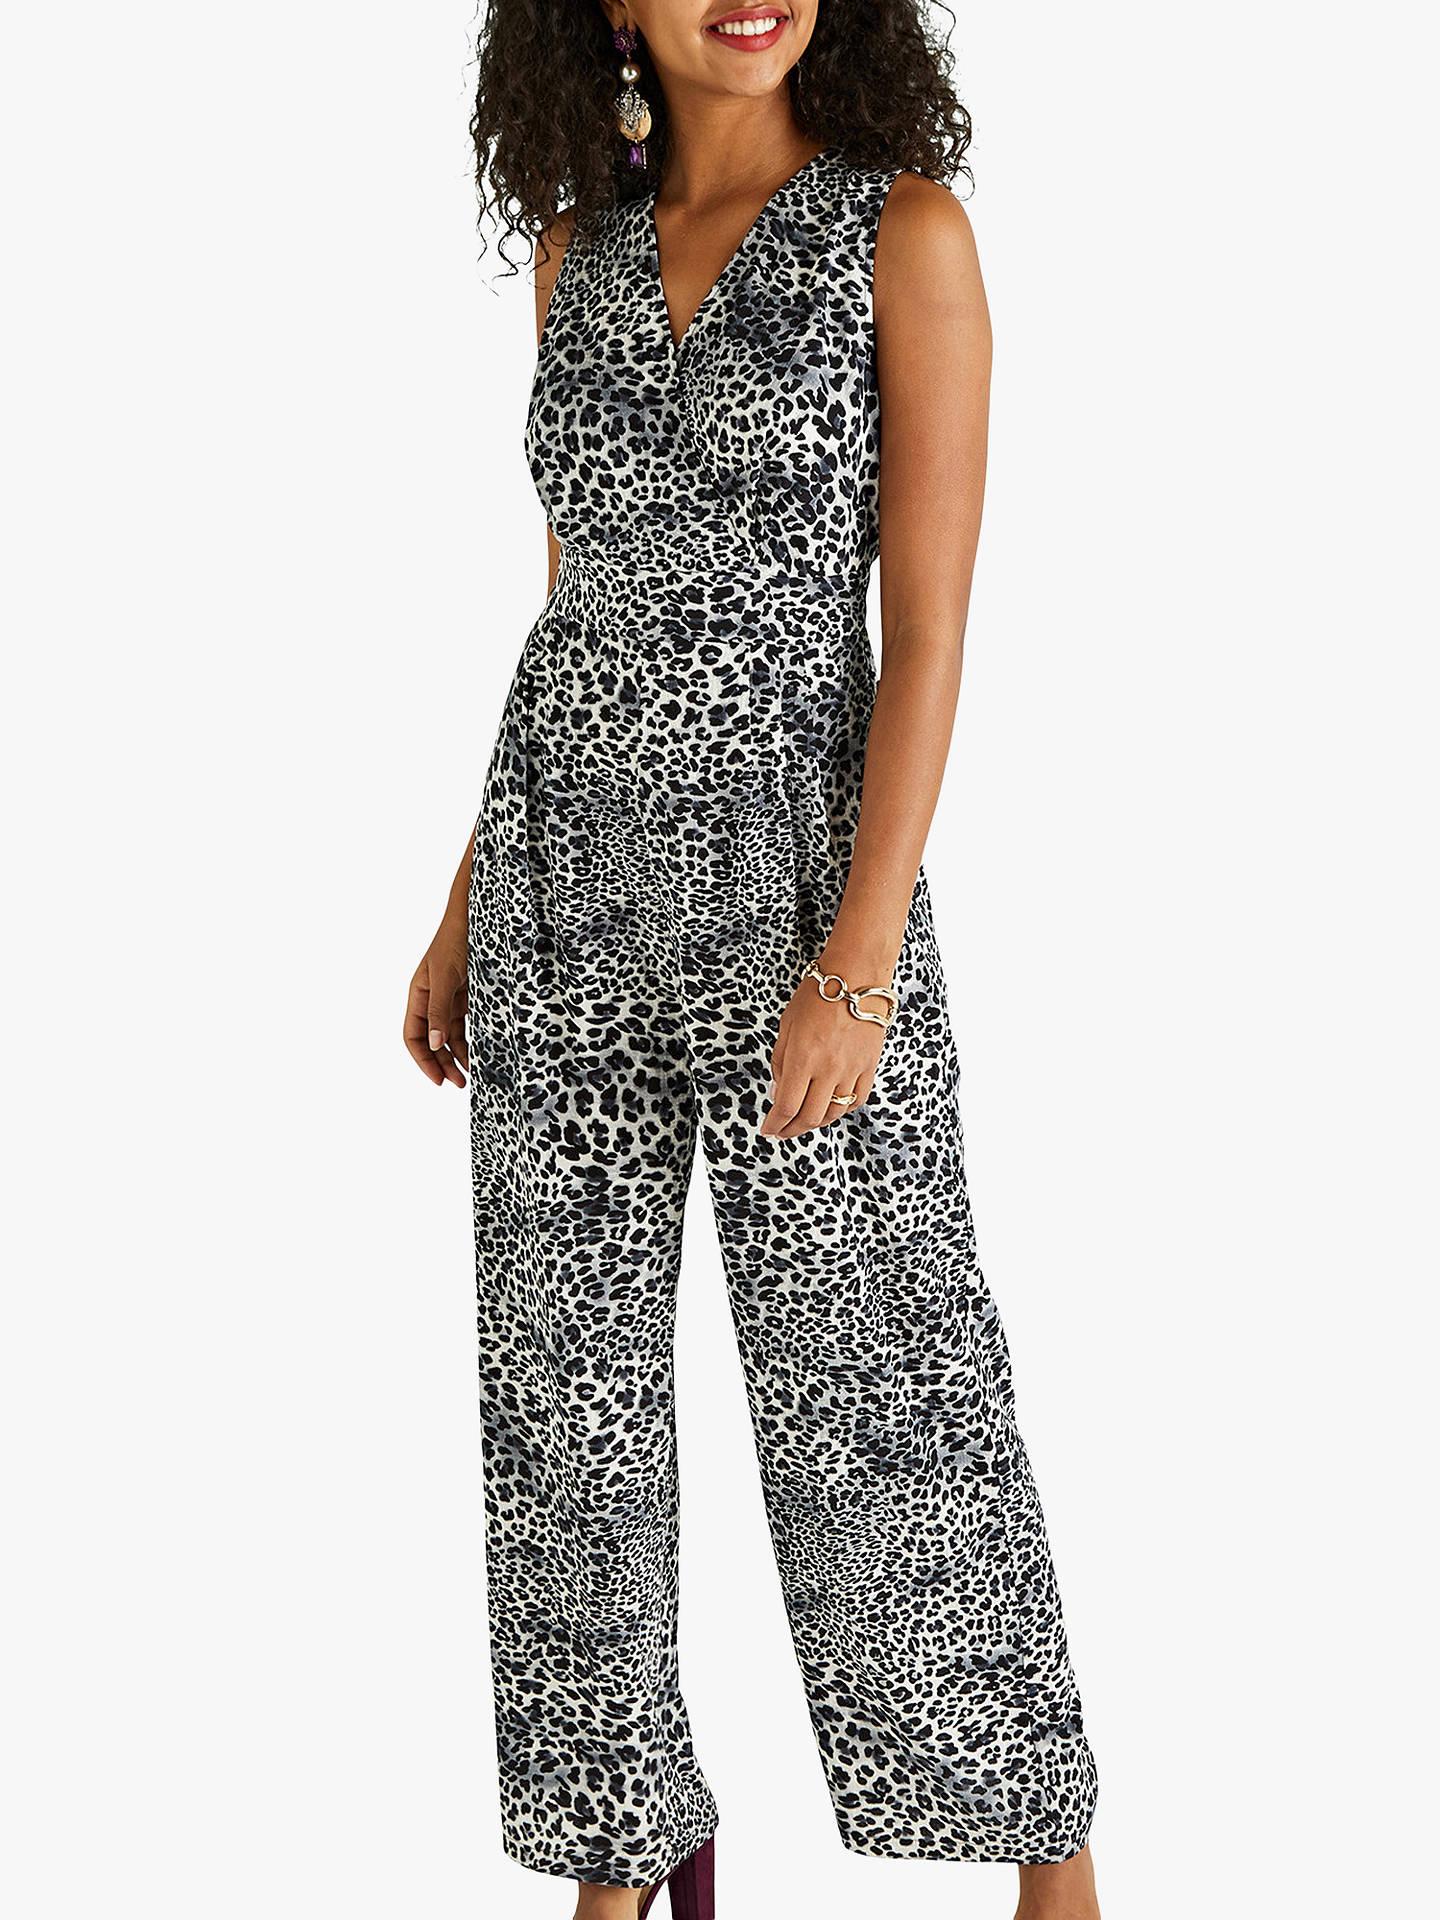 a302f9eda52e Buy Yumi Leopard Print Sleeveless Jumpsuit